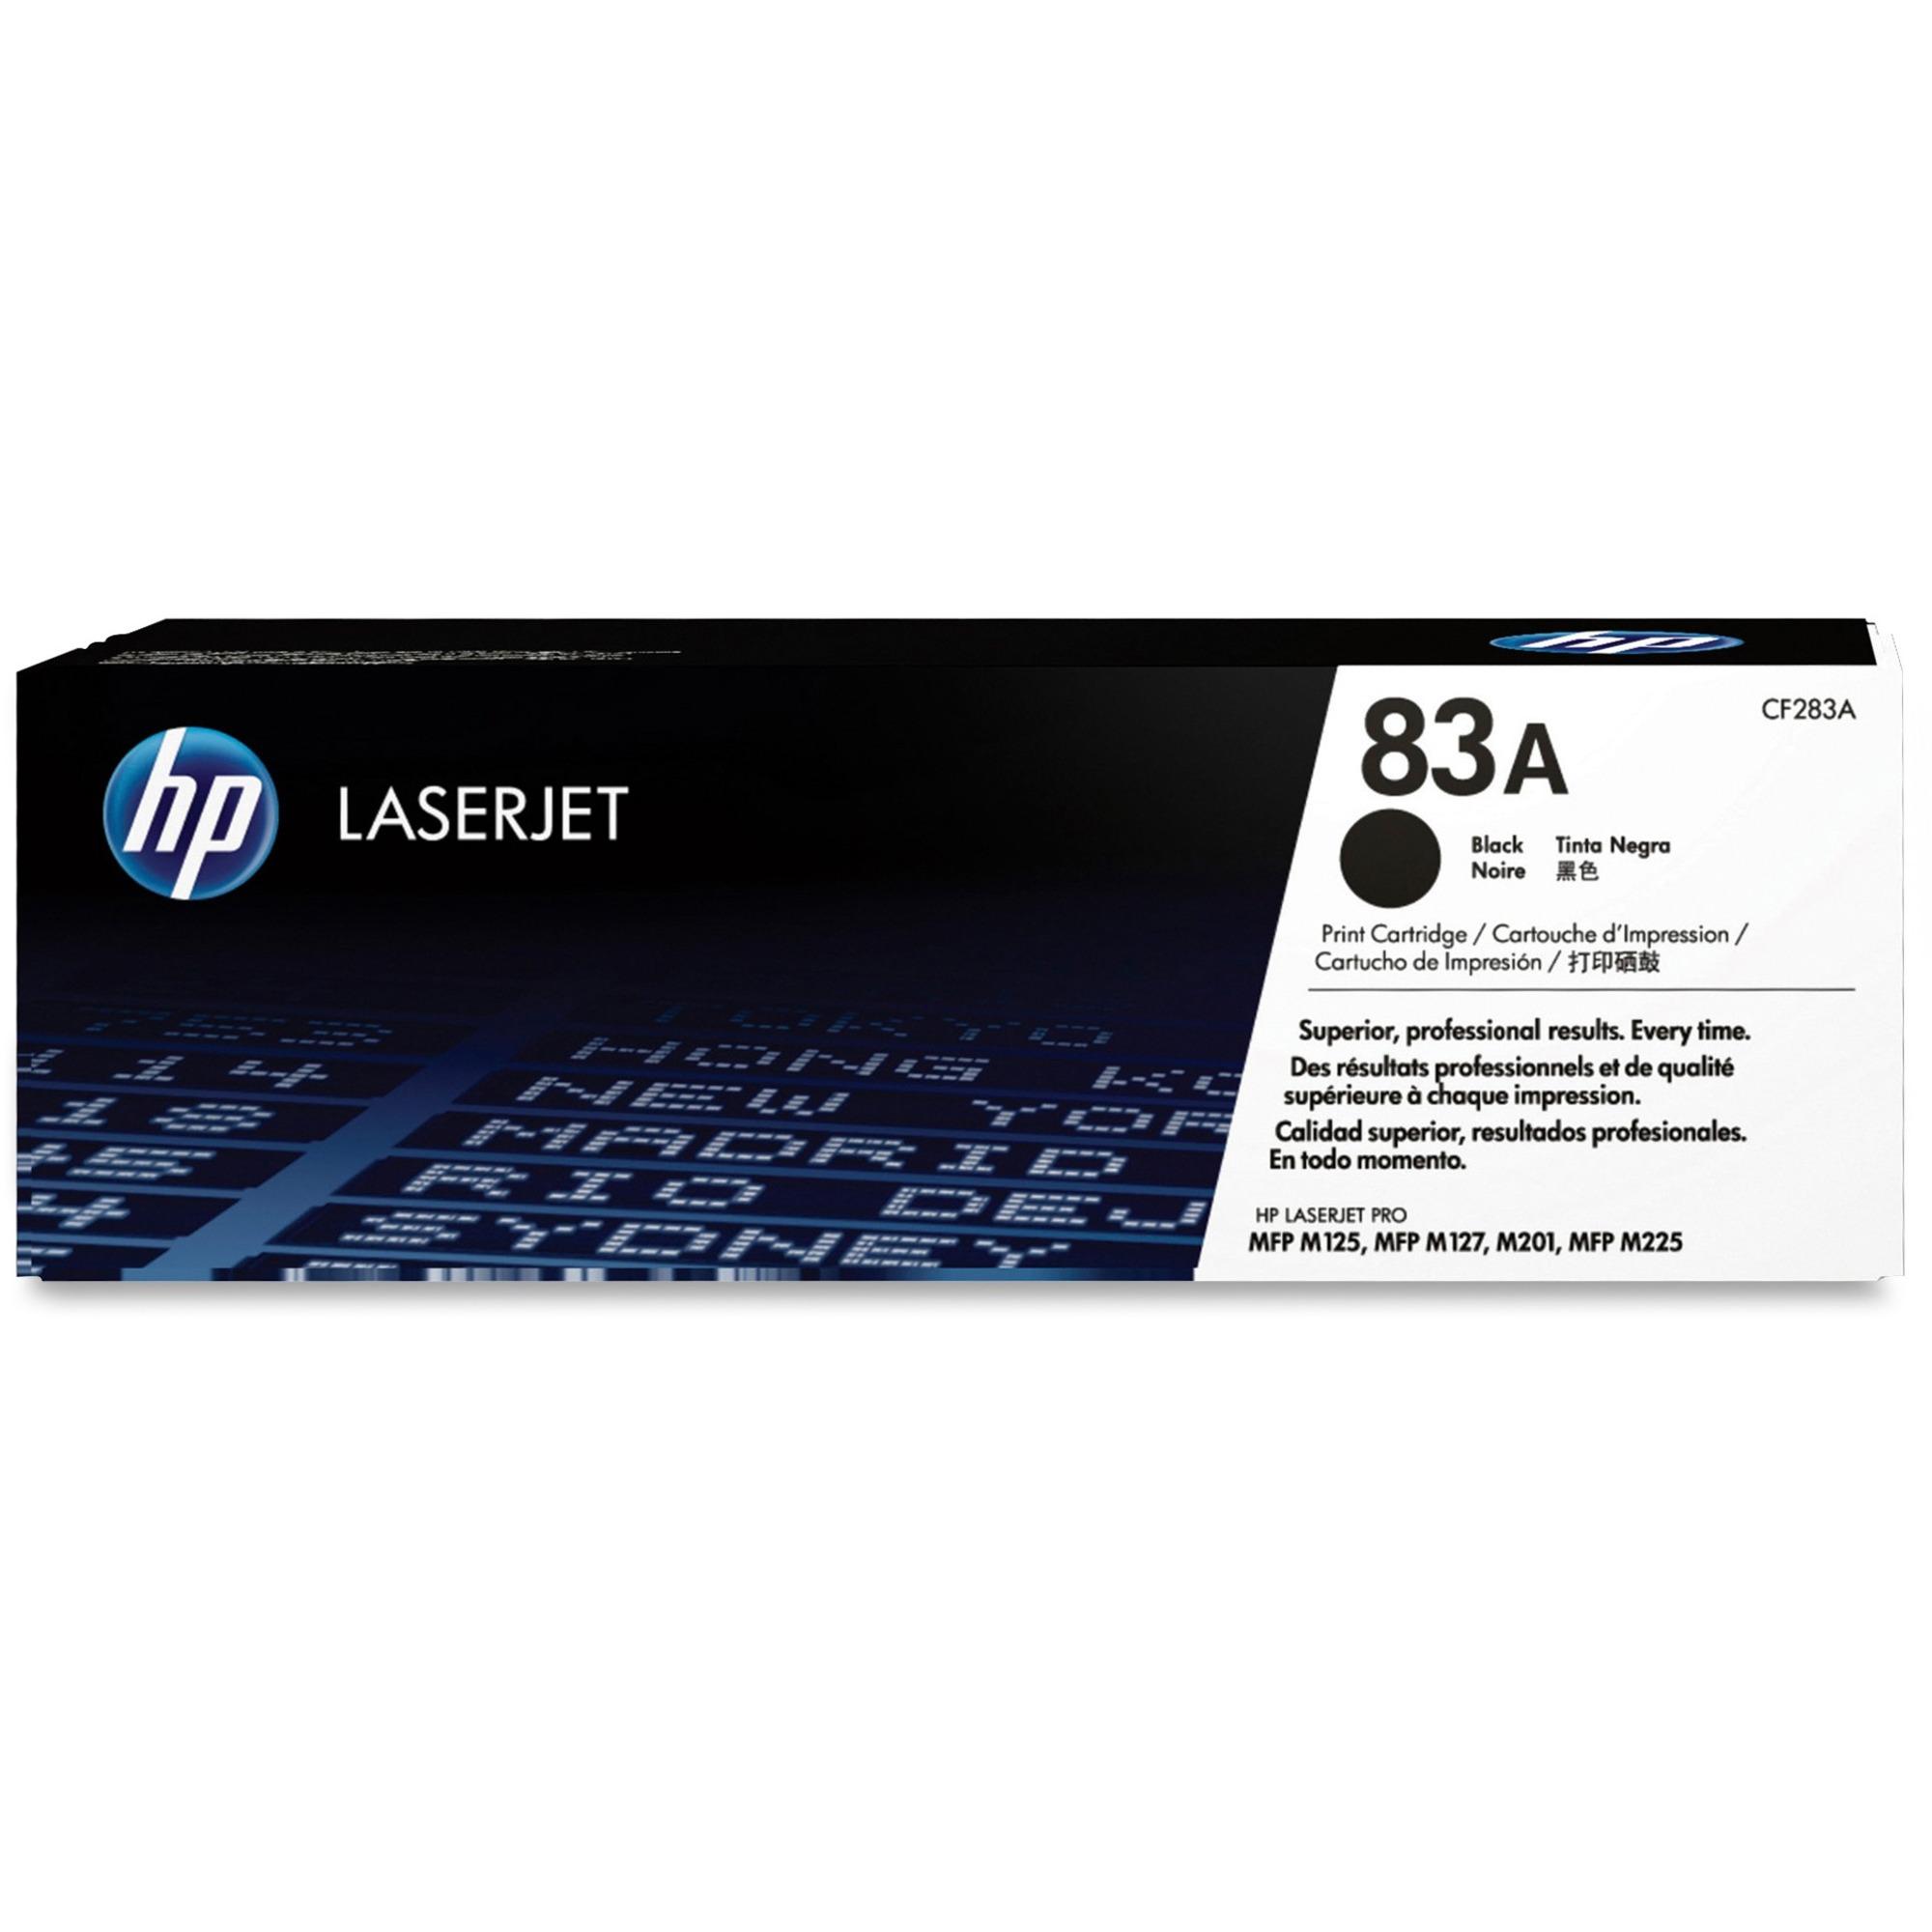 HP 83A Original Toner Cartridge - Single Pack - Laser - 1500 Pages - Black  - 1 Each